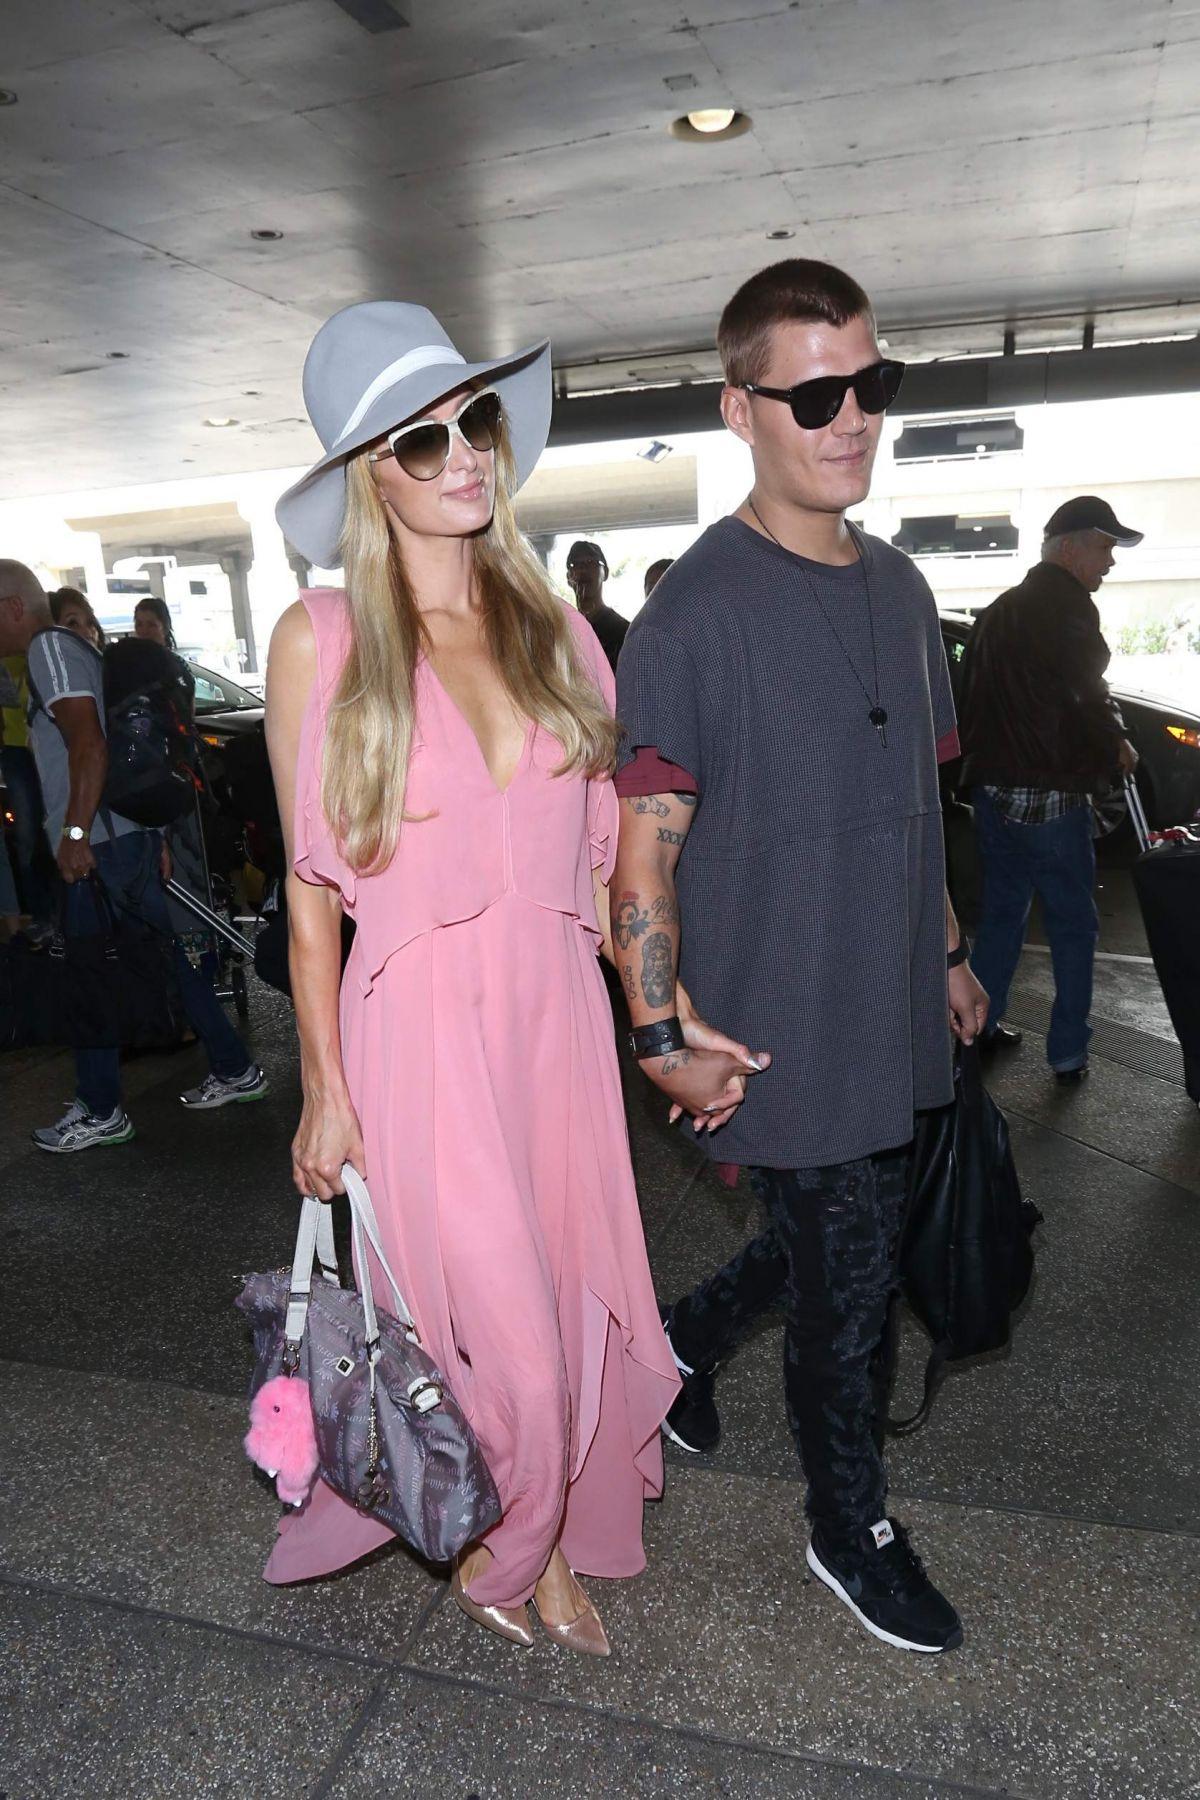 PARIS HILTON and Chris Zlyka at Los Angeles International Airport 08/25/2017